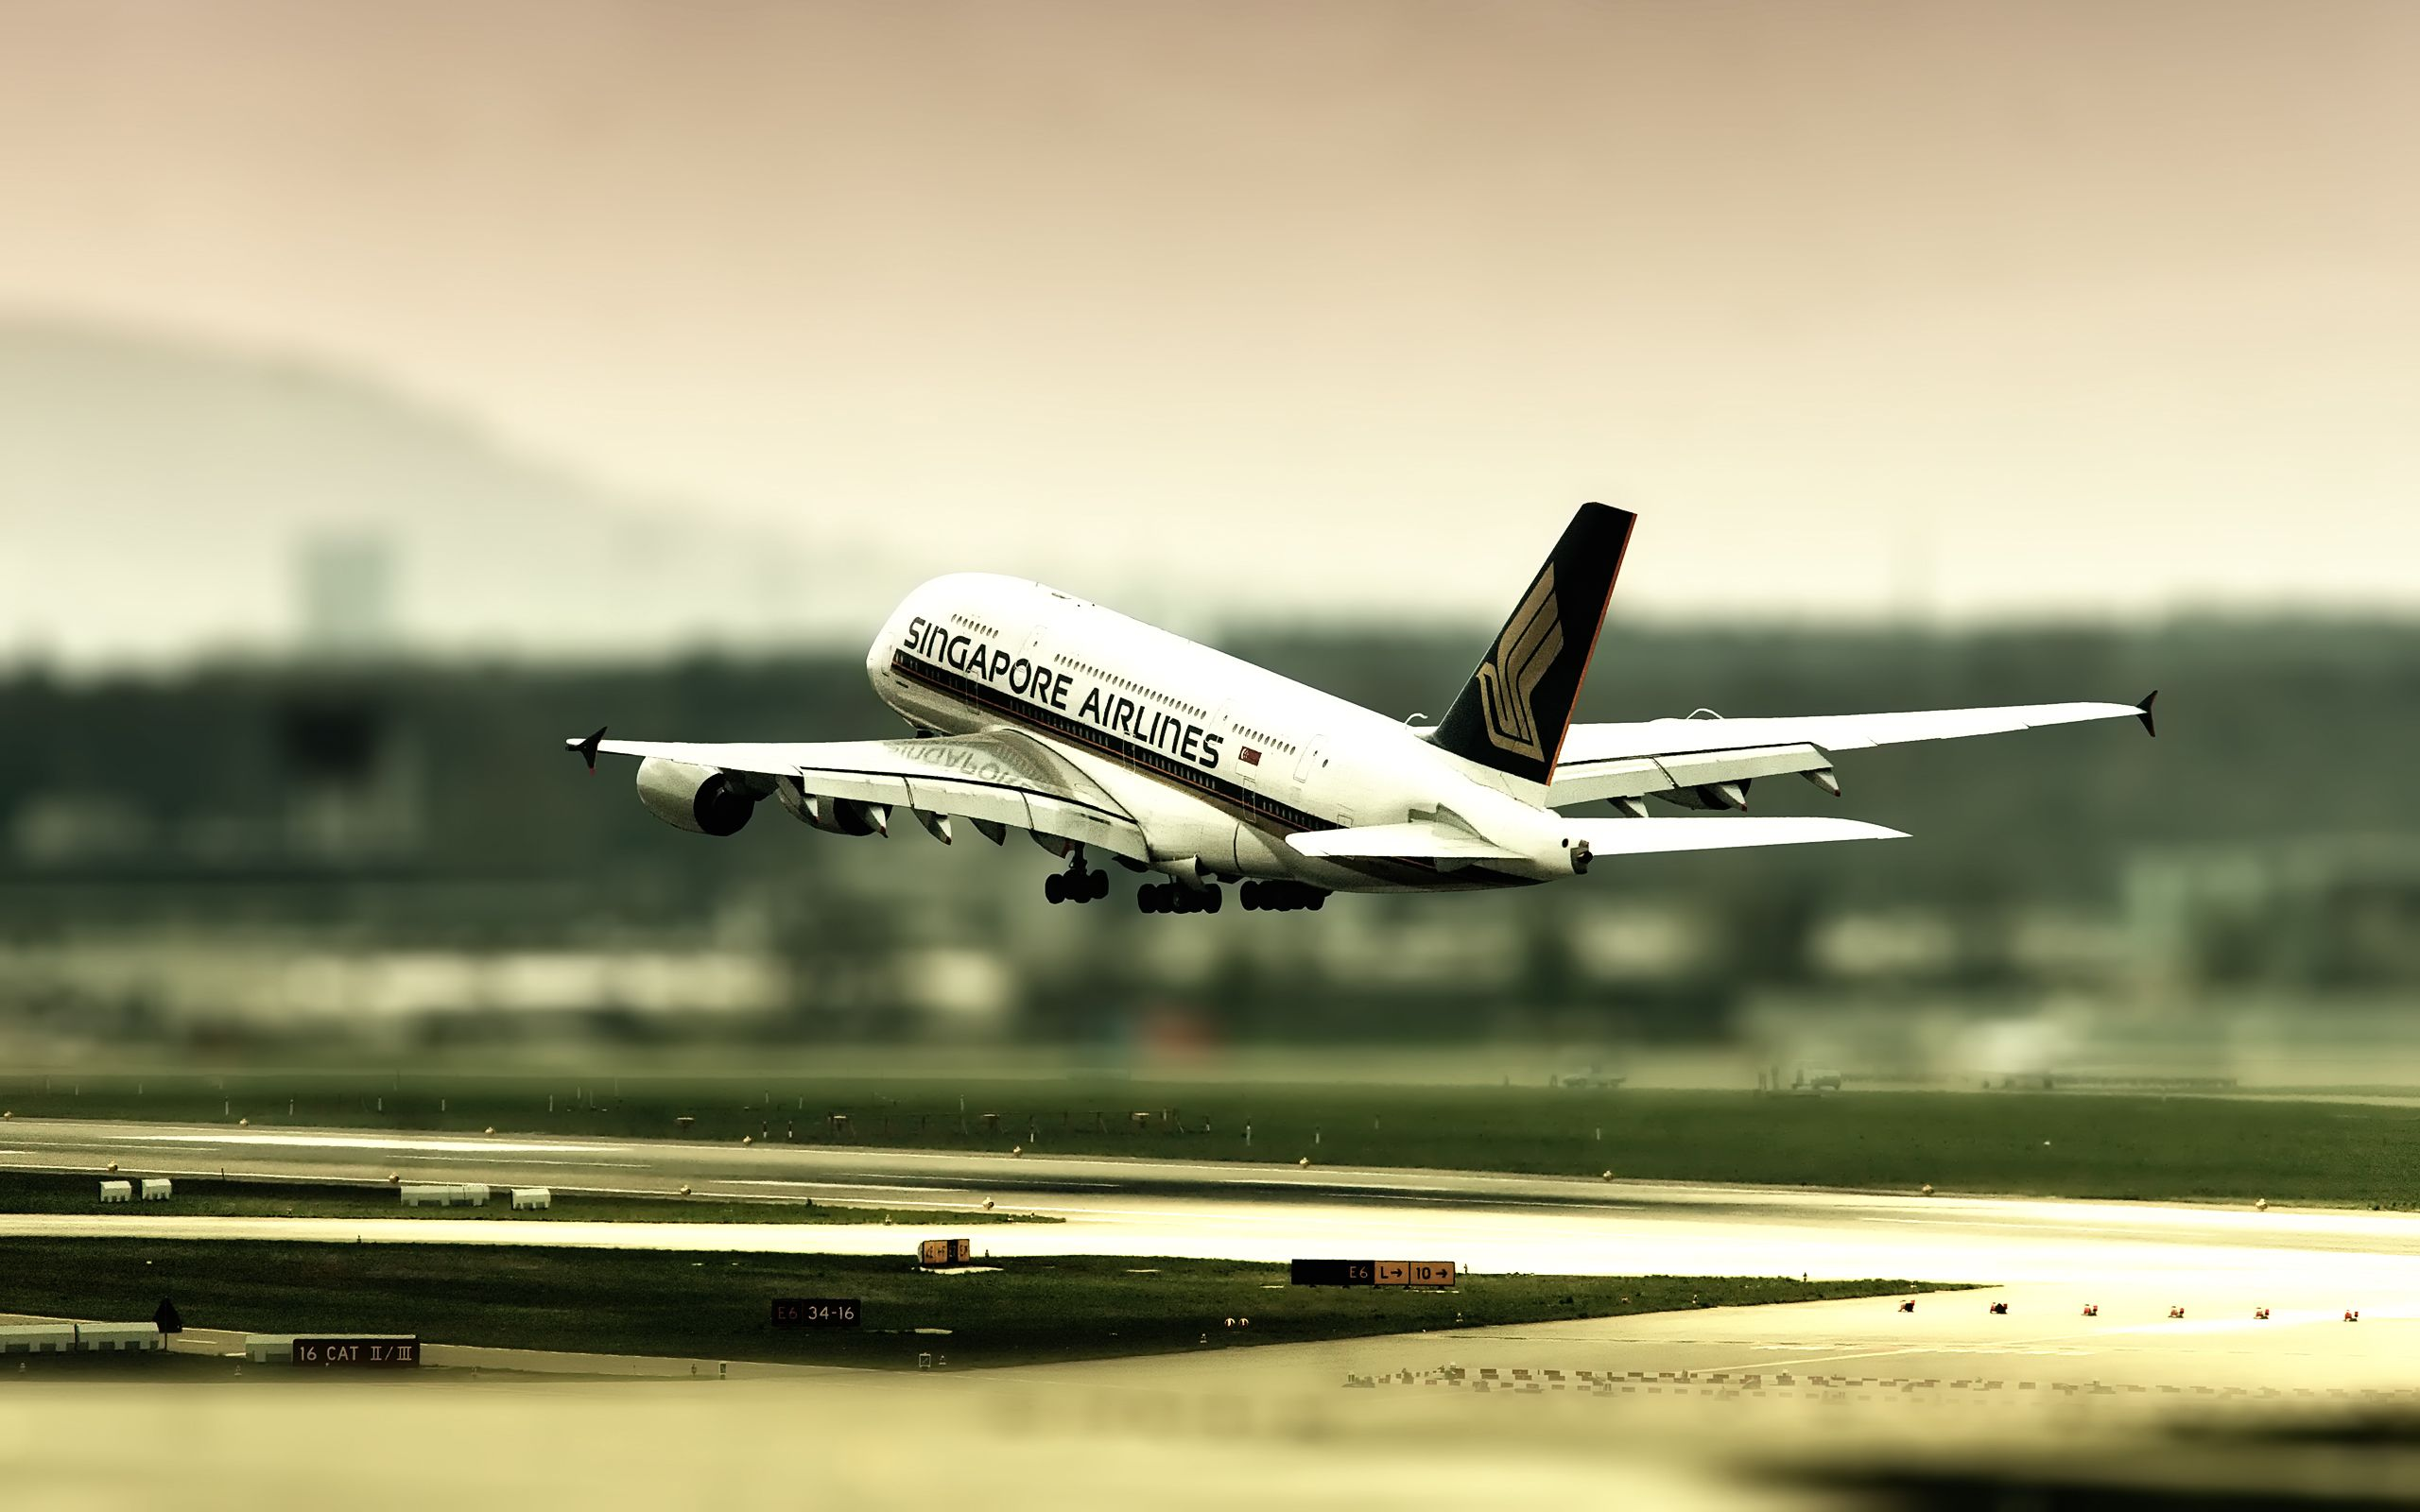 air port images